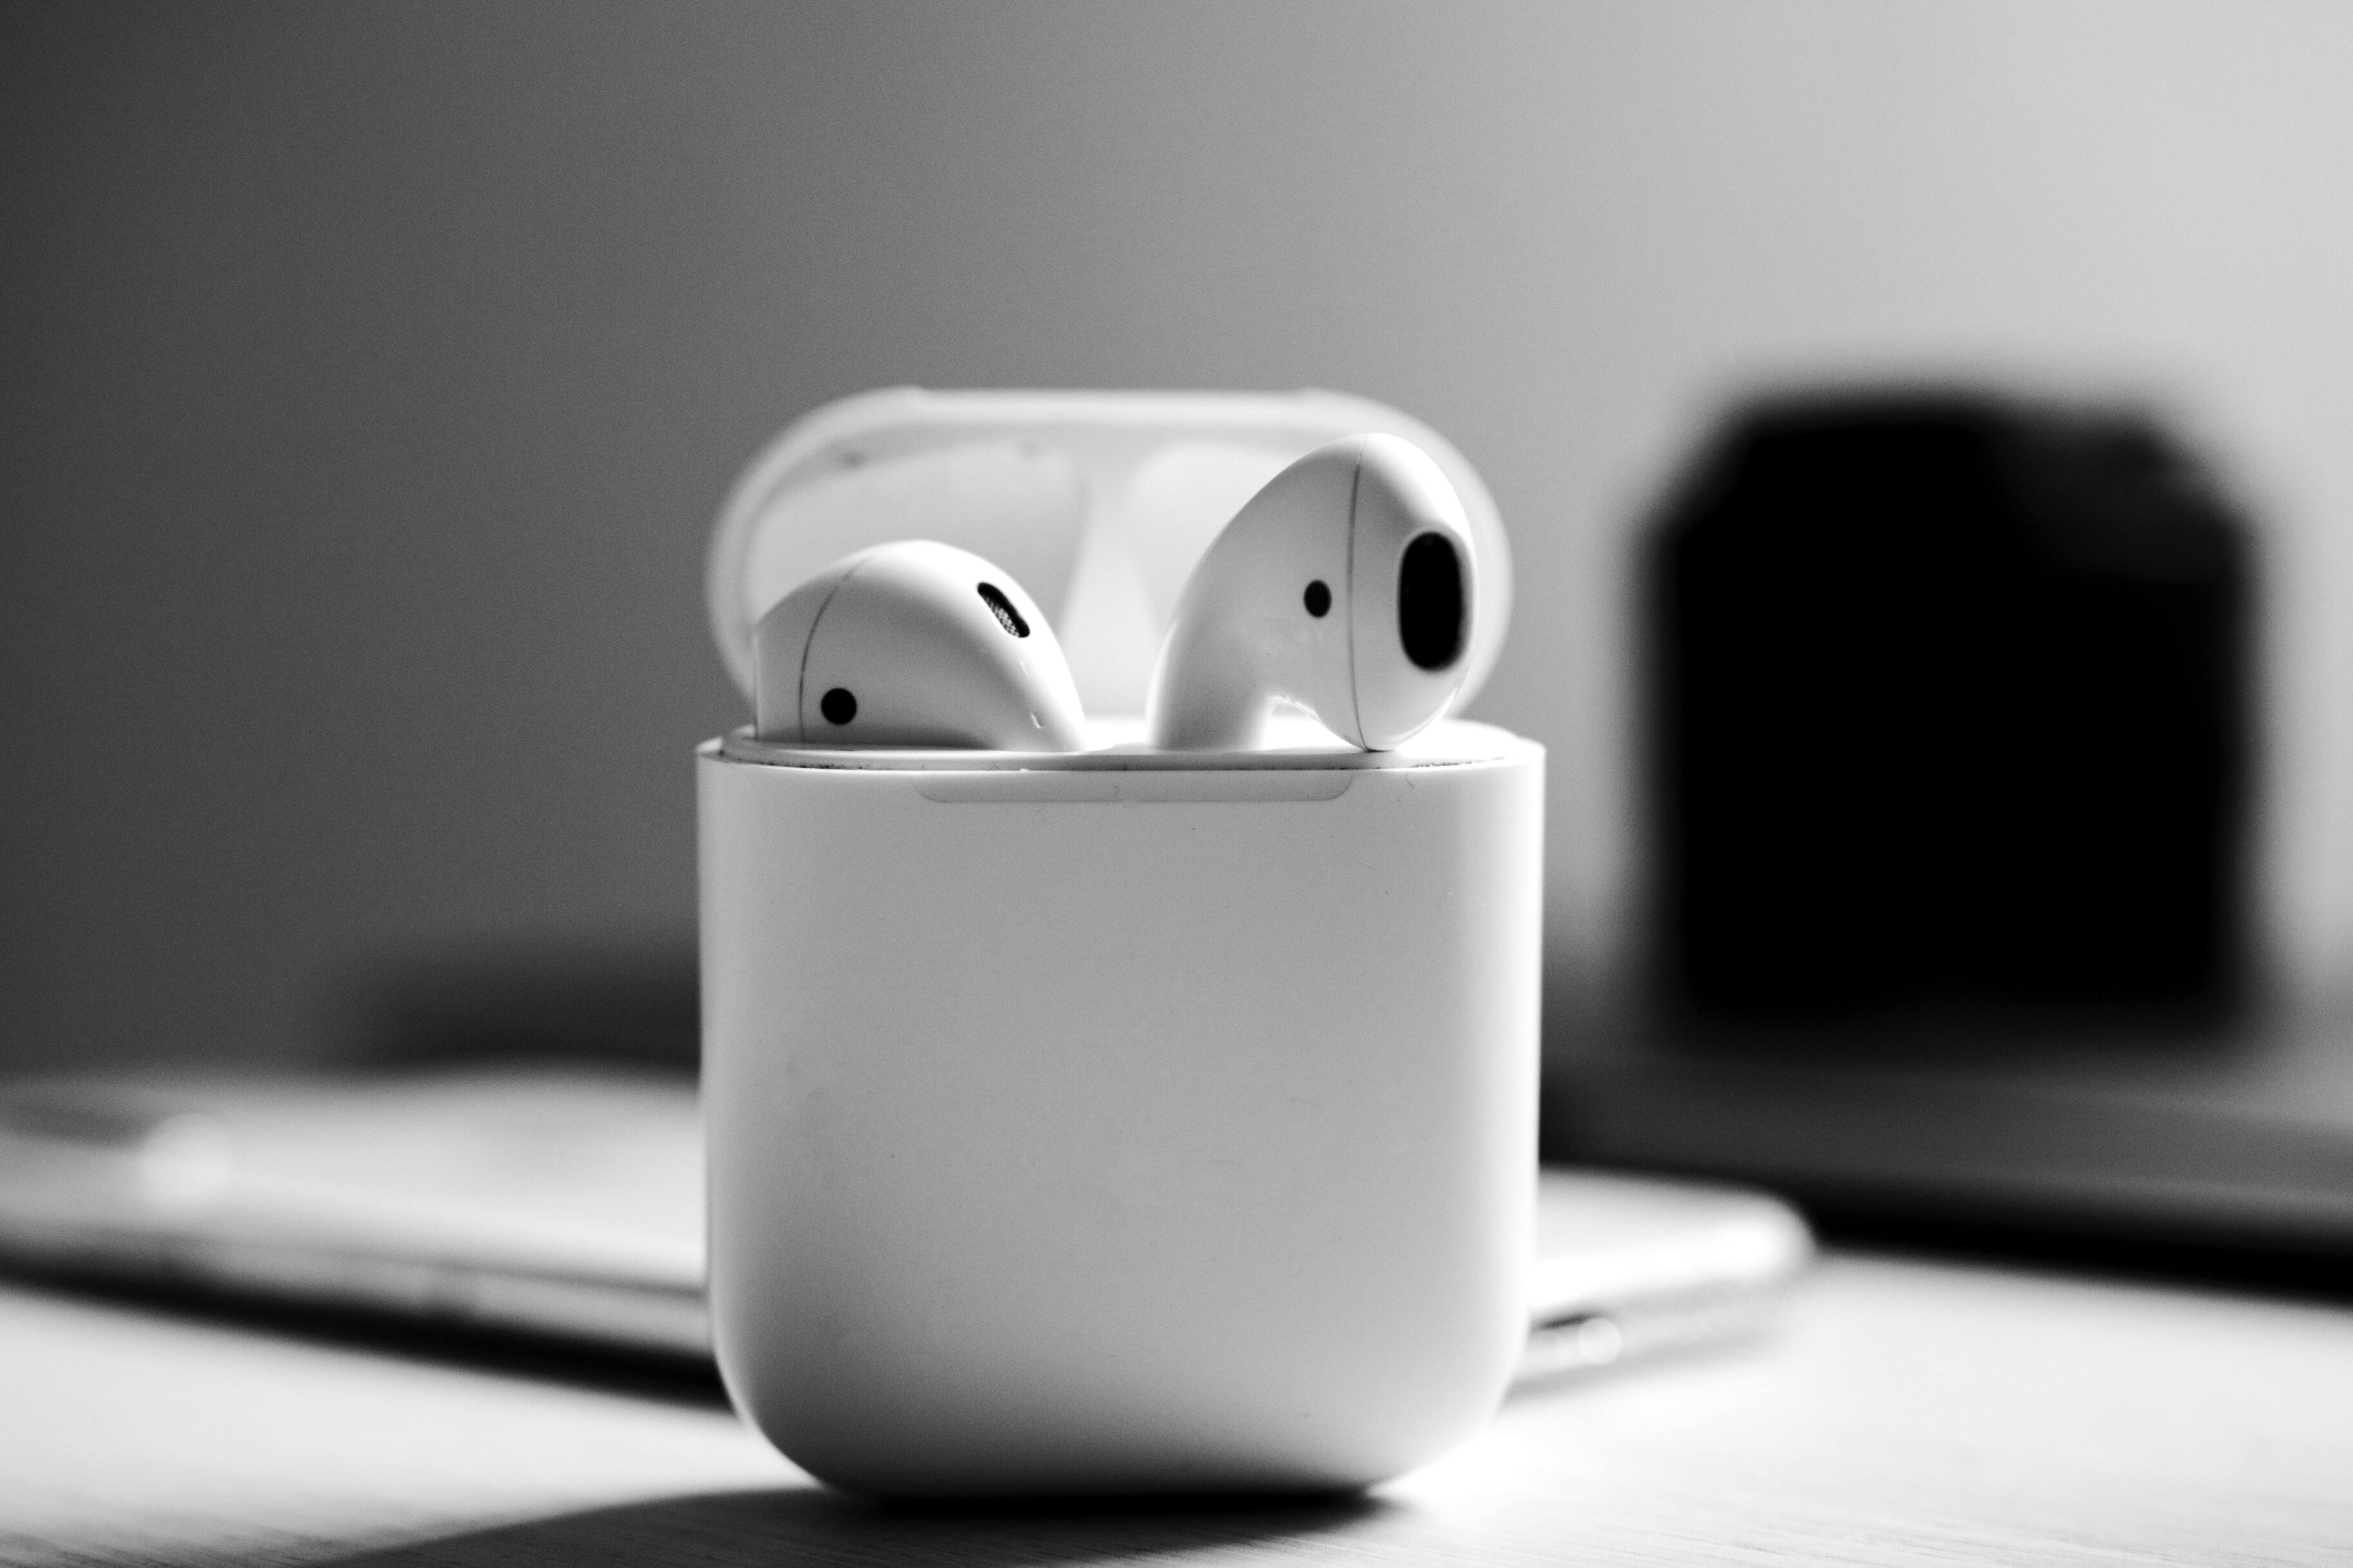 Более дешёвые наушники снизили продажи Apple AirPods